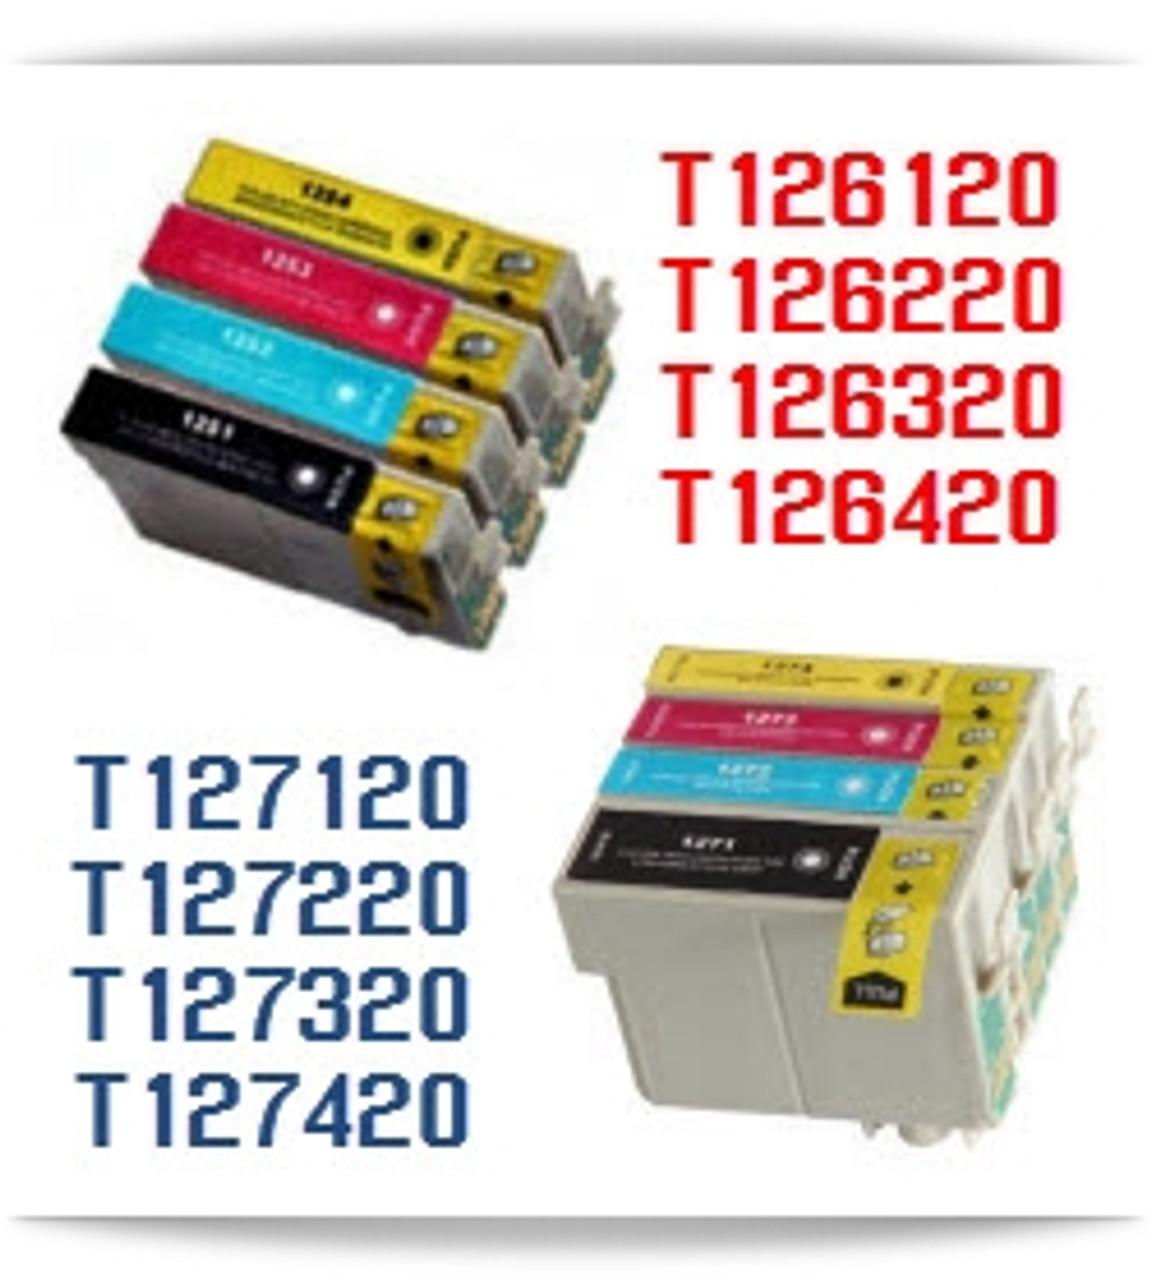 T126, T127 Epson Inkjet Printer Compatible Ink Cartridges